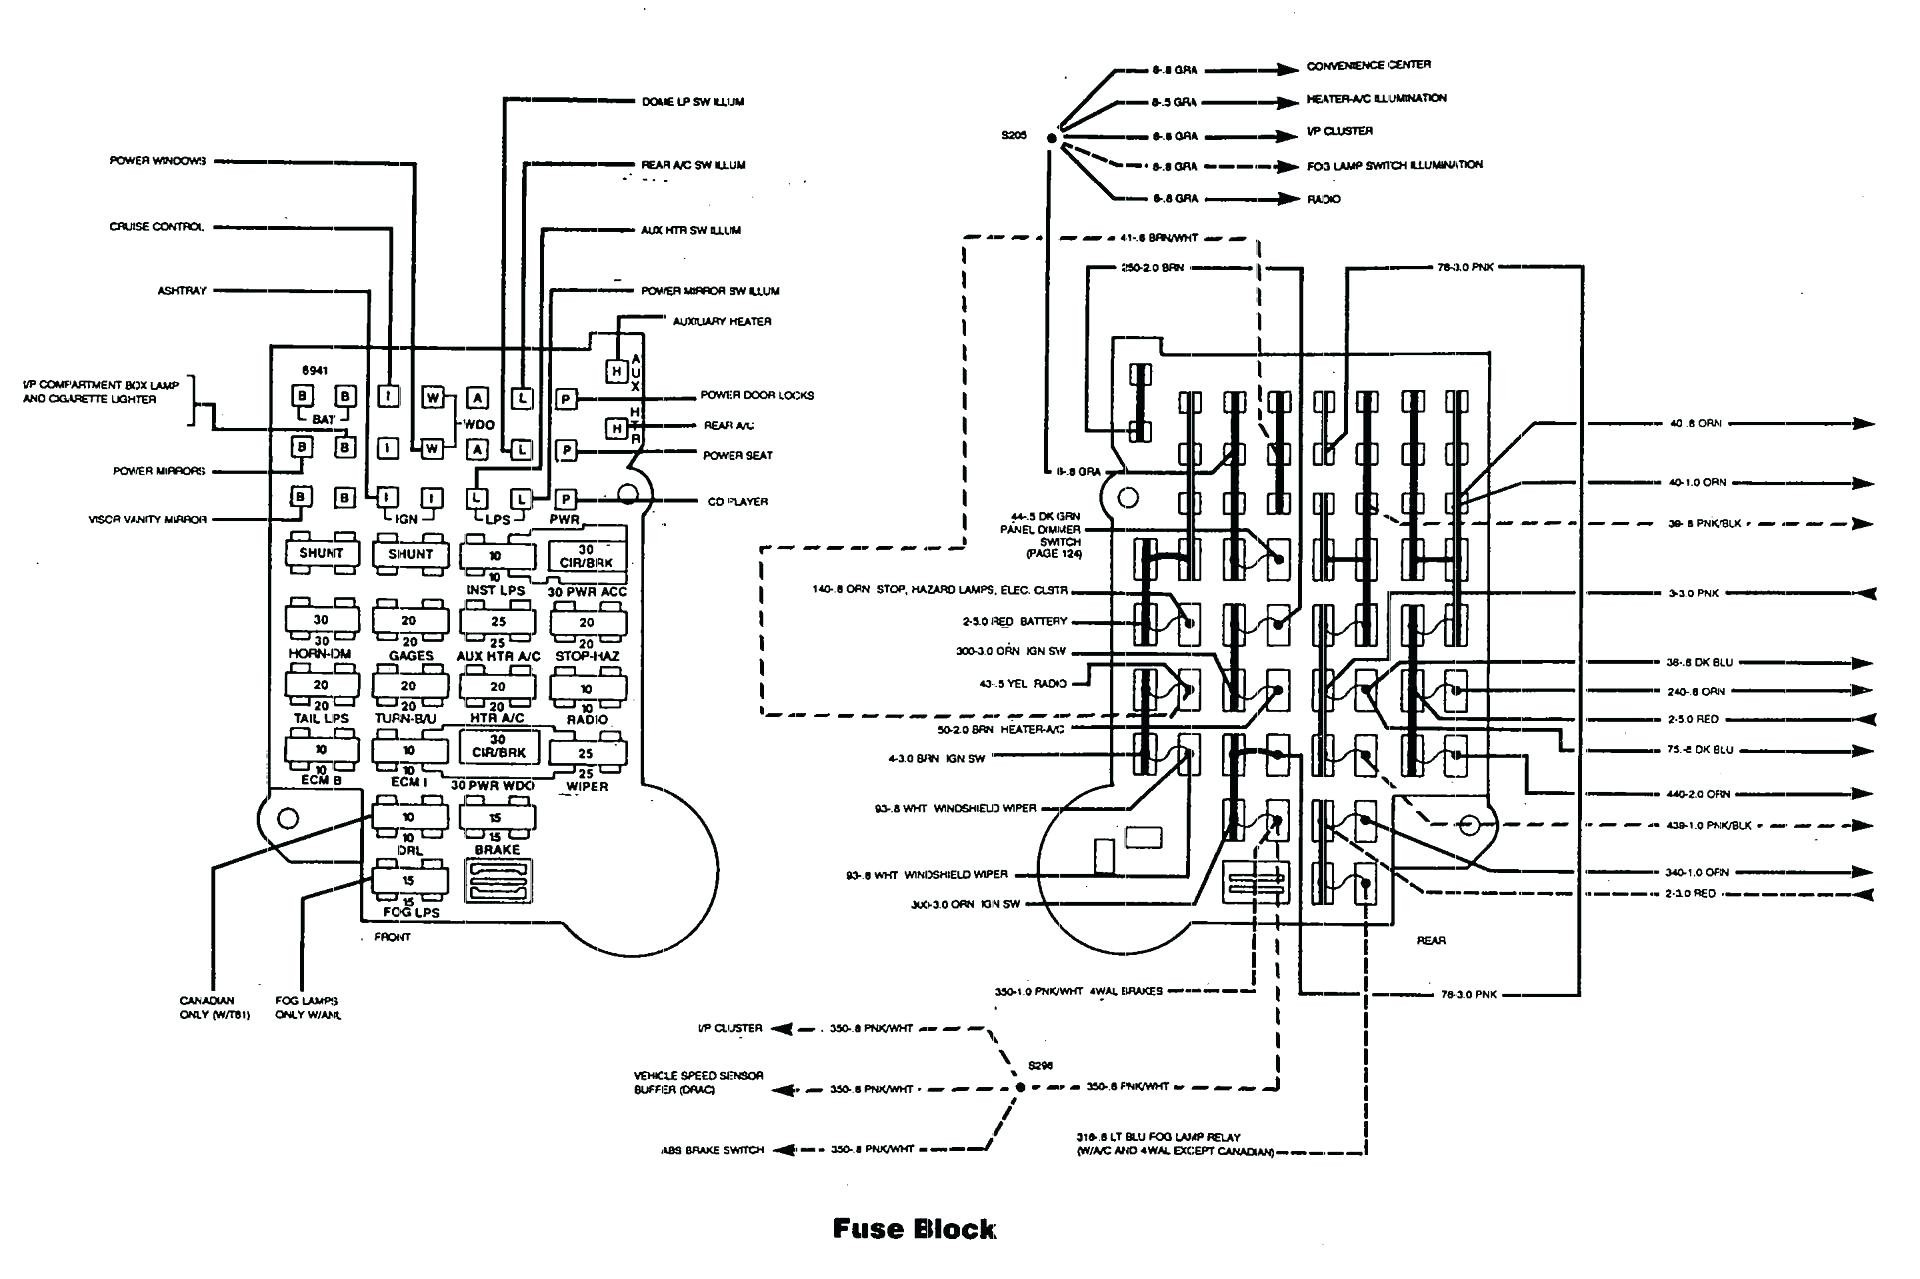 1998 Ford Mustang Wiring Diagram Alternator Ranger To 98 Mustangs Pontiac Grand Prix Data Of